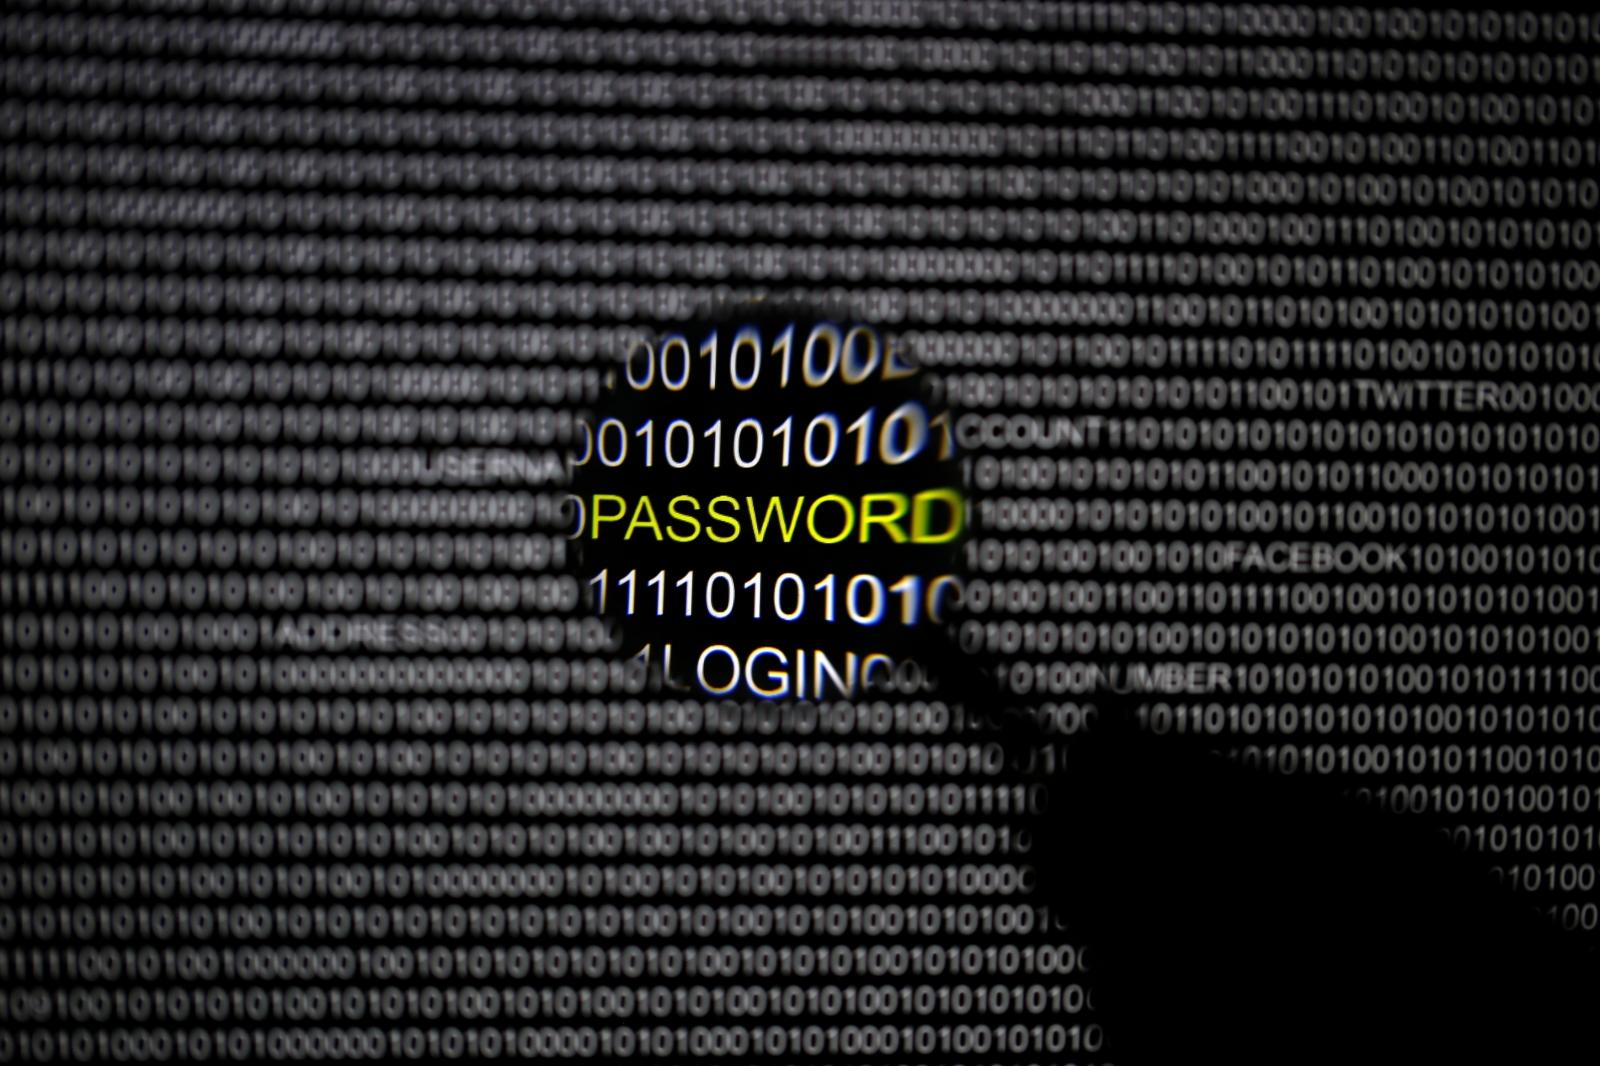 TeamViewer accounts bulk hacked draining users bank accounts